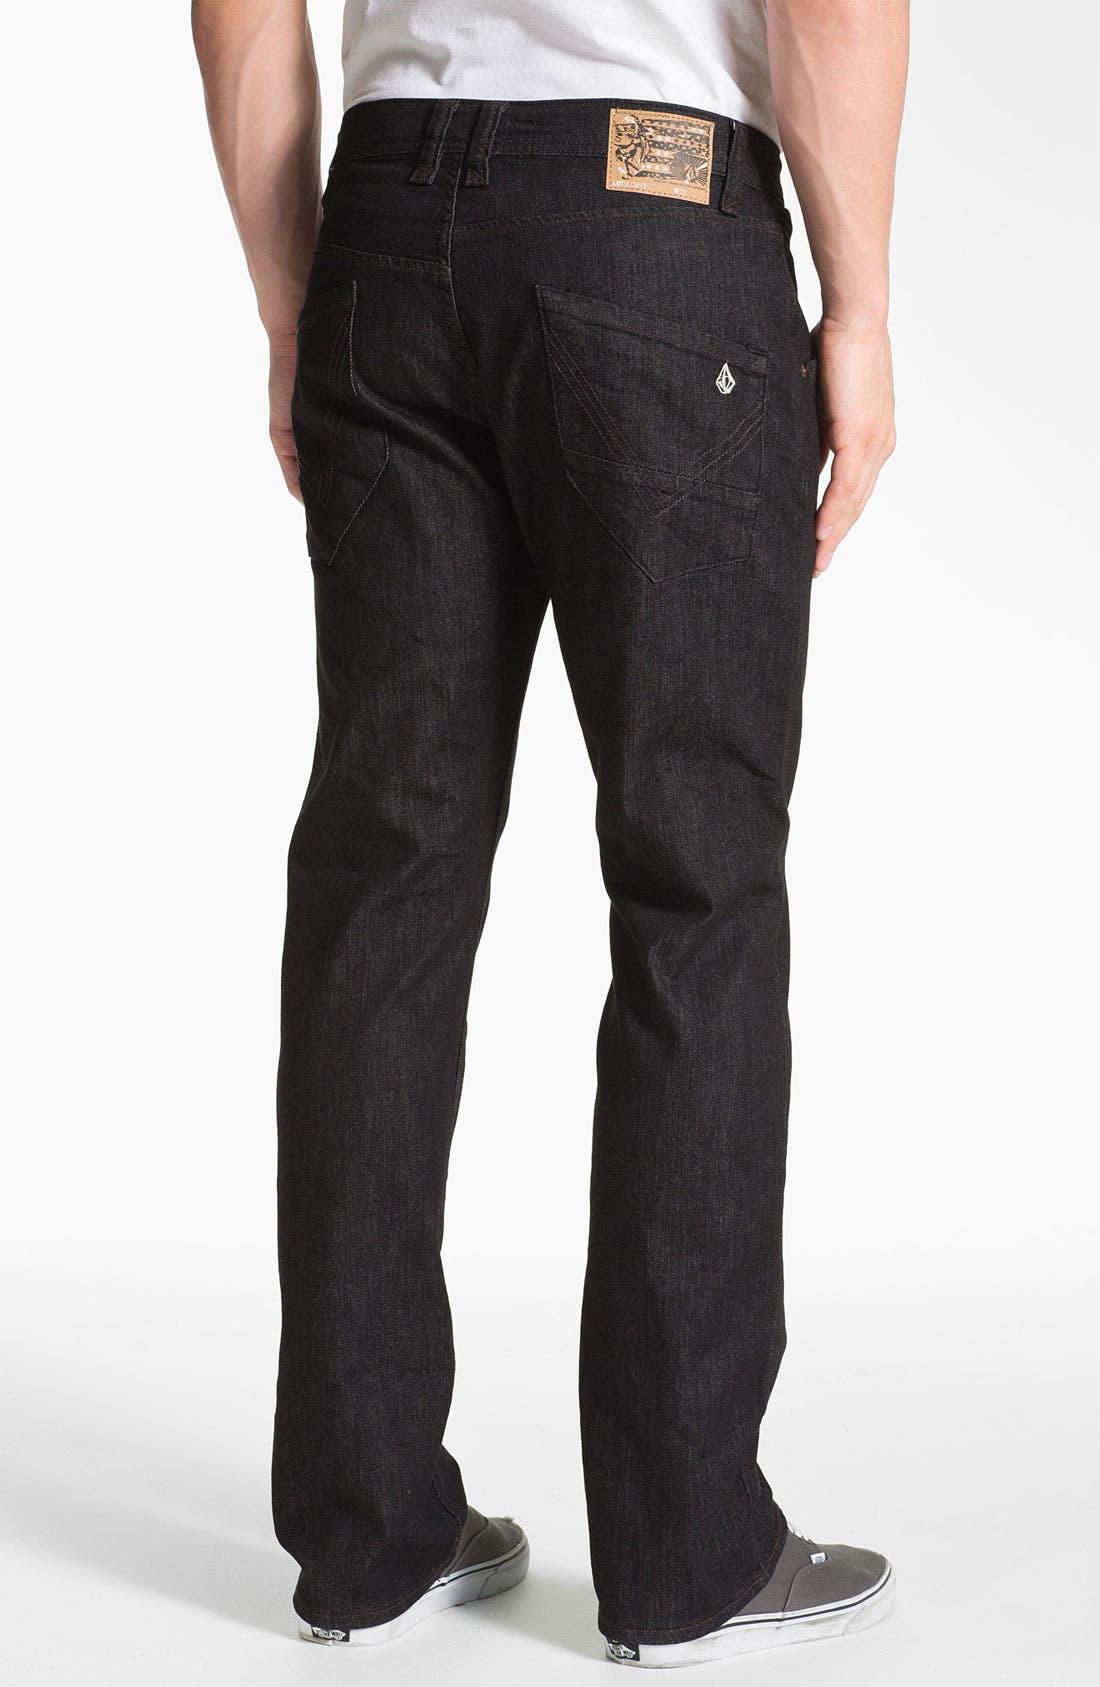 VOLCOM 'Nova' Slim Straight Leg Jeans, Main, color, 001